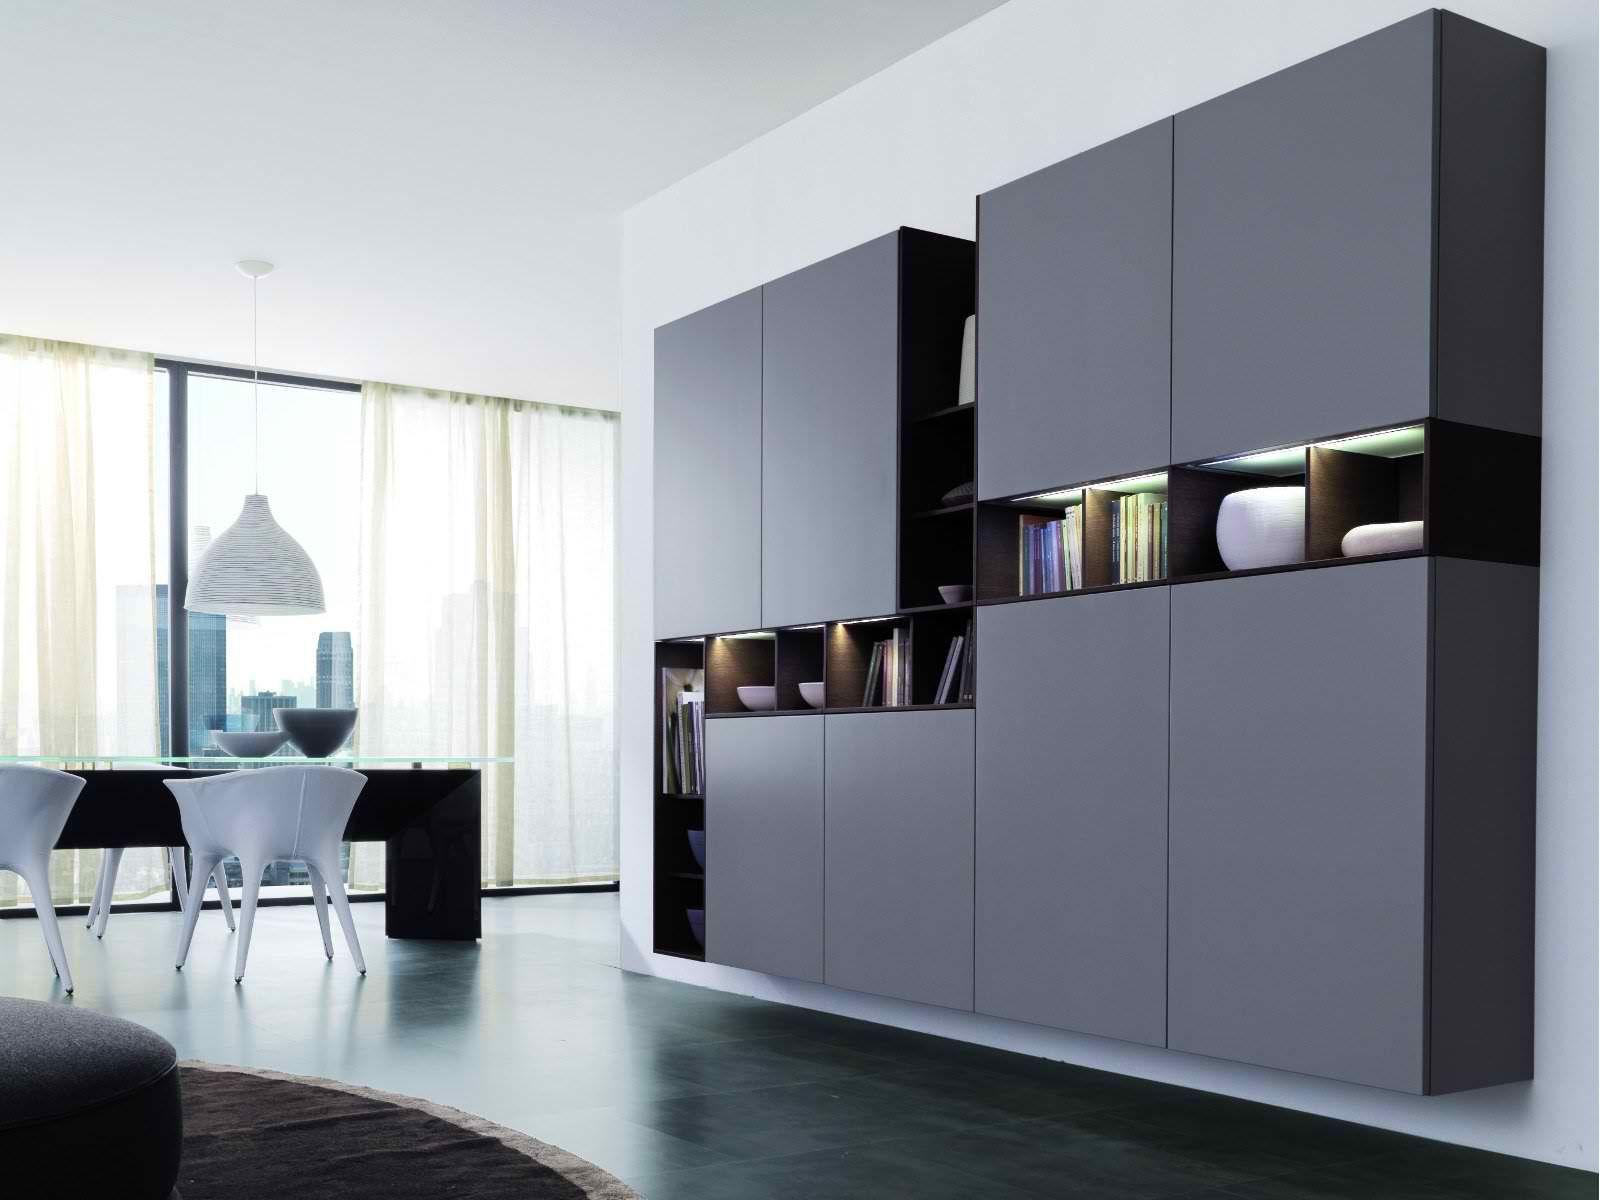 design möbel italien kühlen pic oder eabbacbbfacd jpg